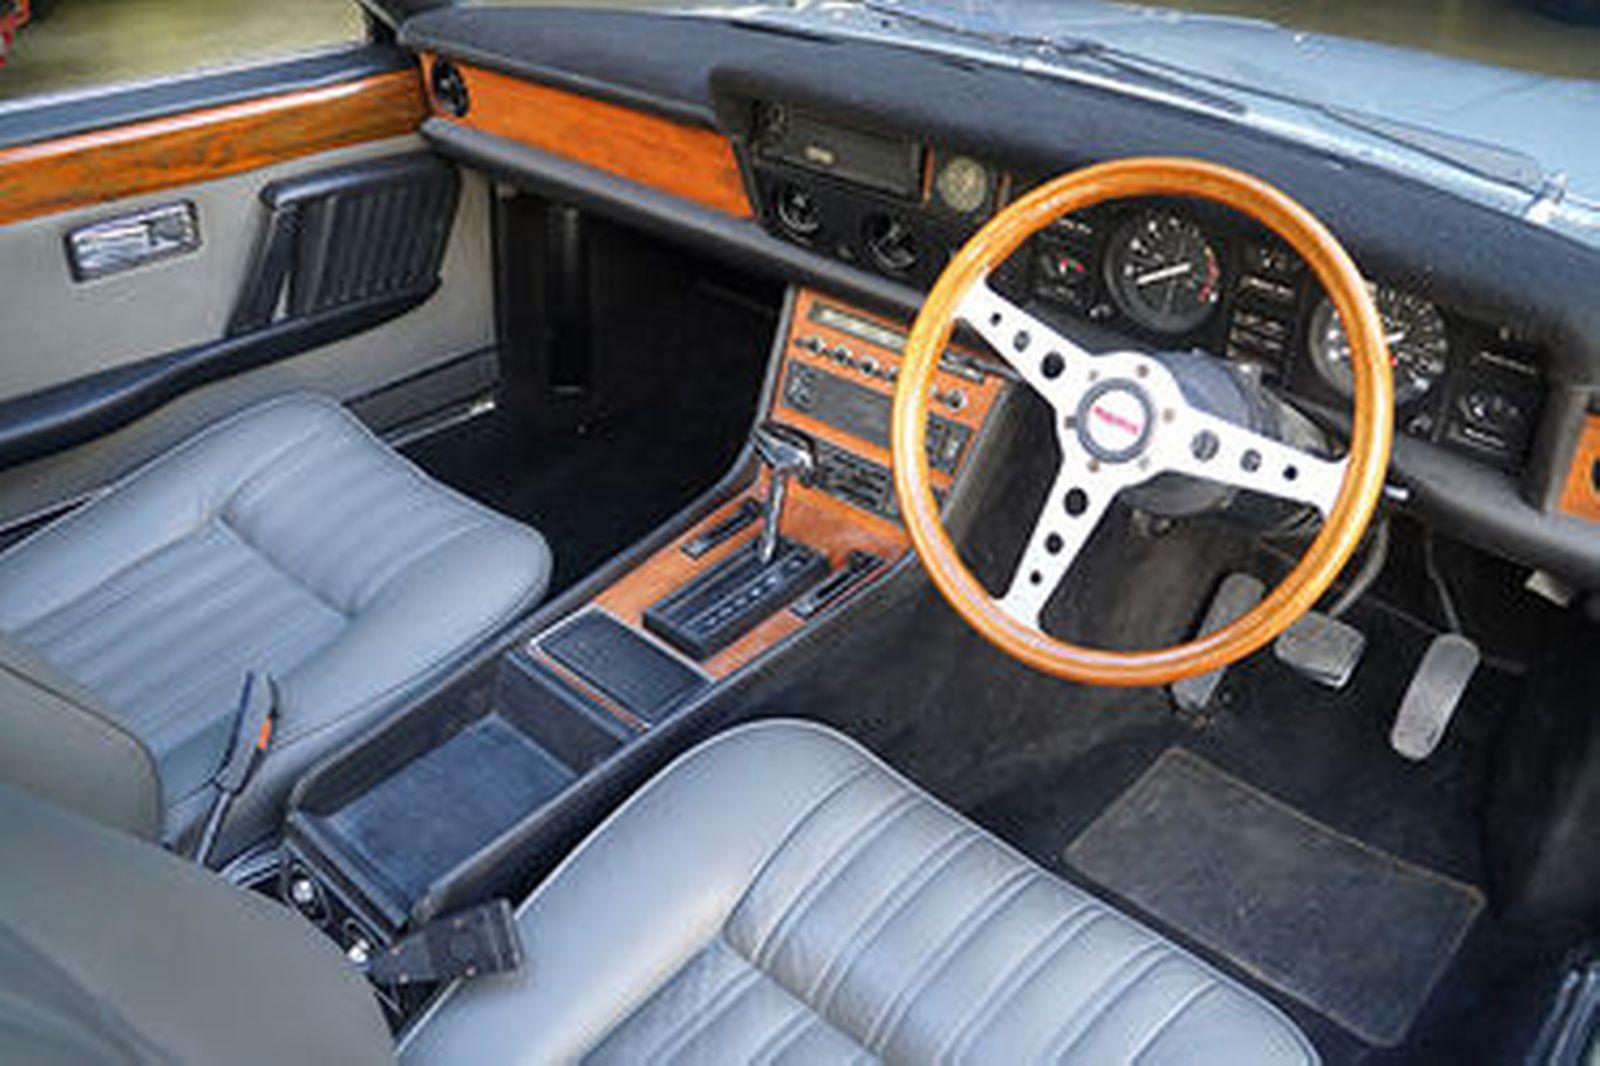 Car Auction Online >> Sold: Fiat 130 V6 Coupe Auctions - Lot 16 - Shannons